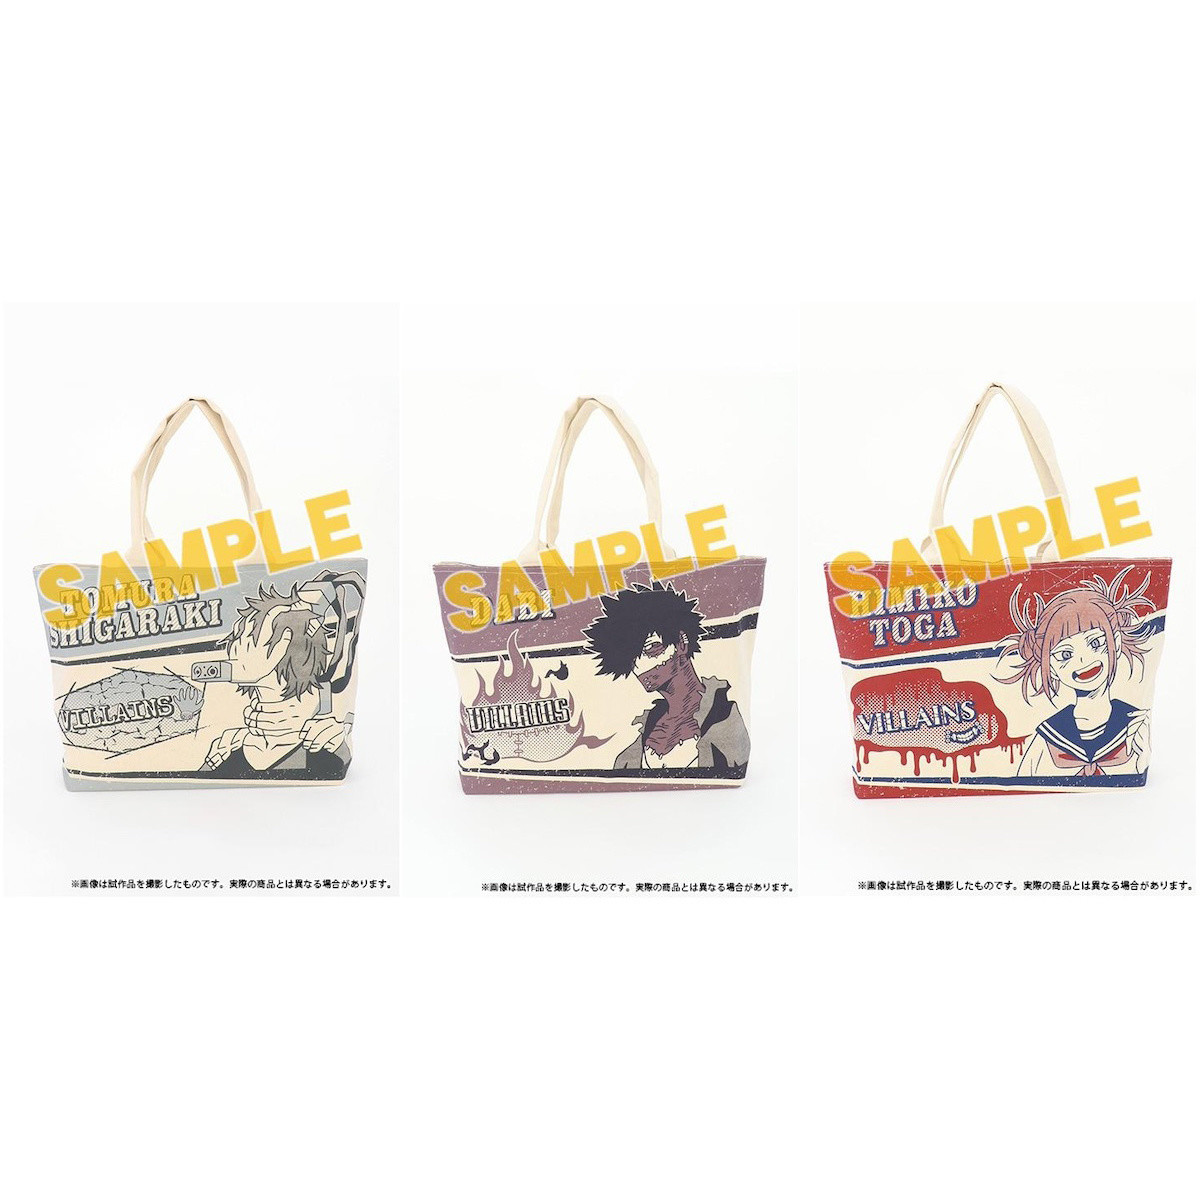 17e2a4216 My Hero Academia Large Tote Bag Collection   Tokyo Otaku Mode Shop